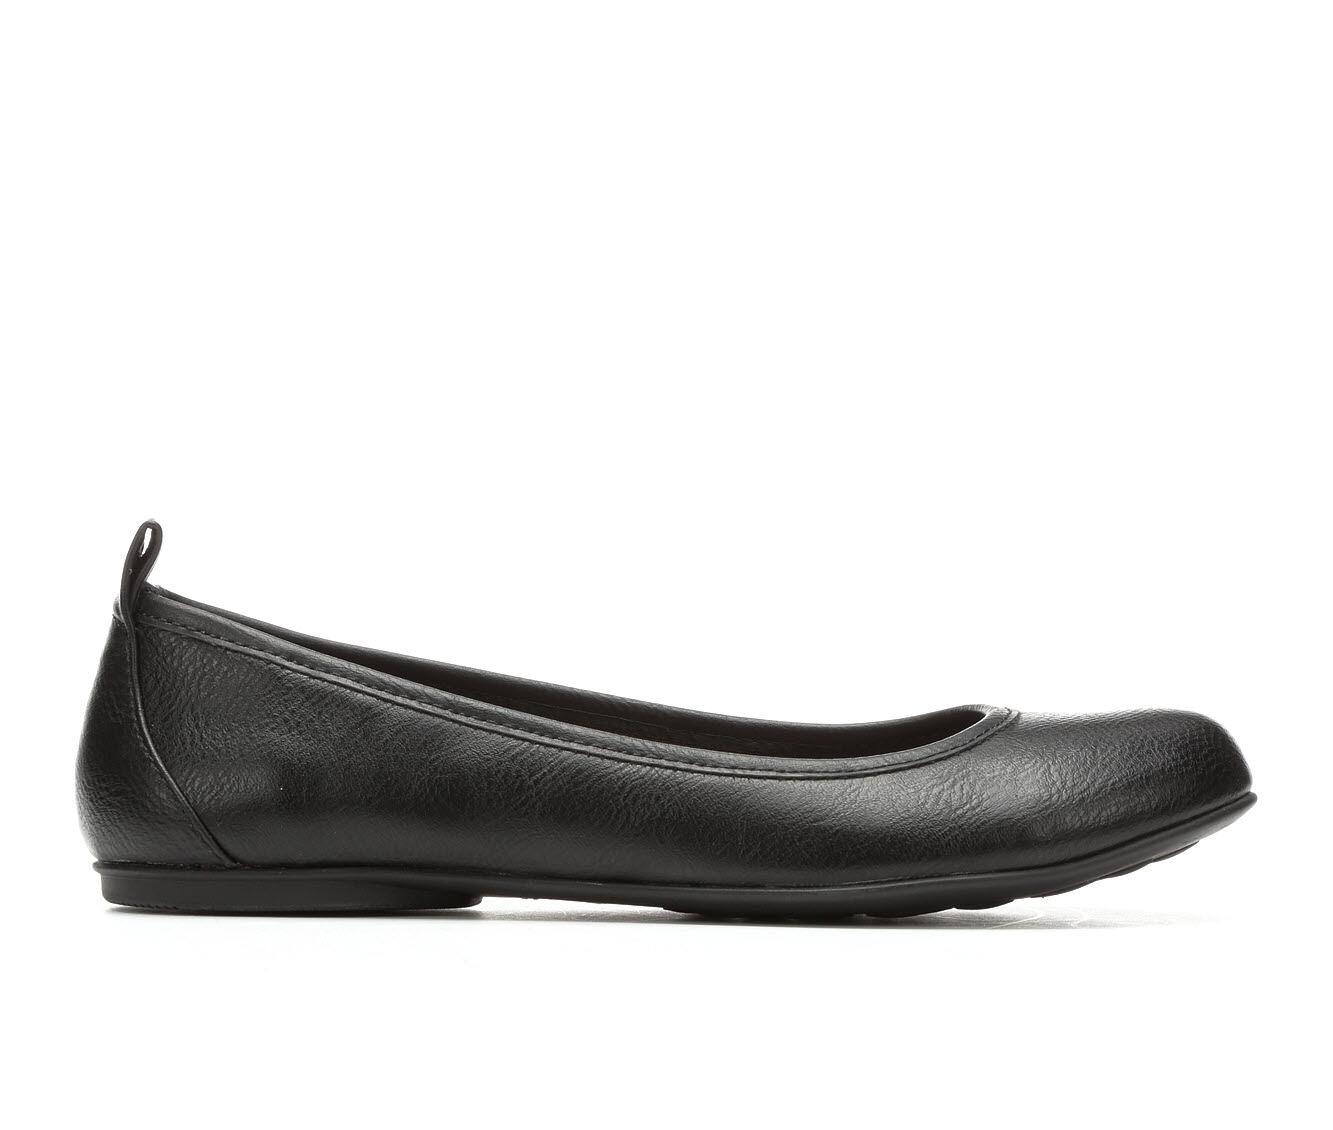 uk shoes_kd6063